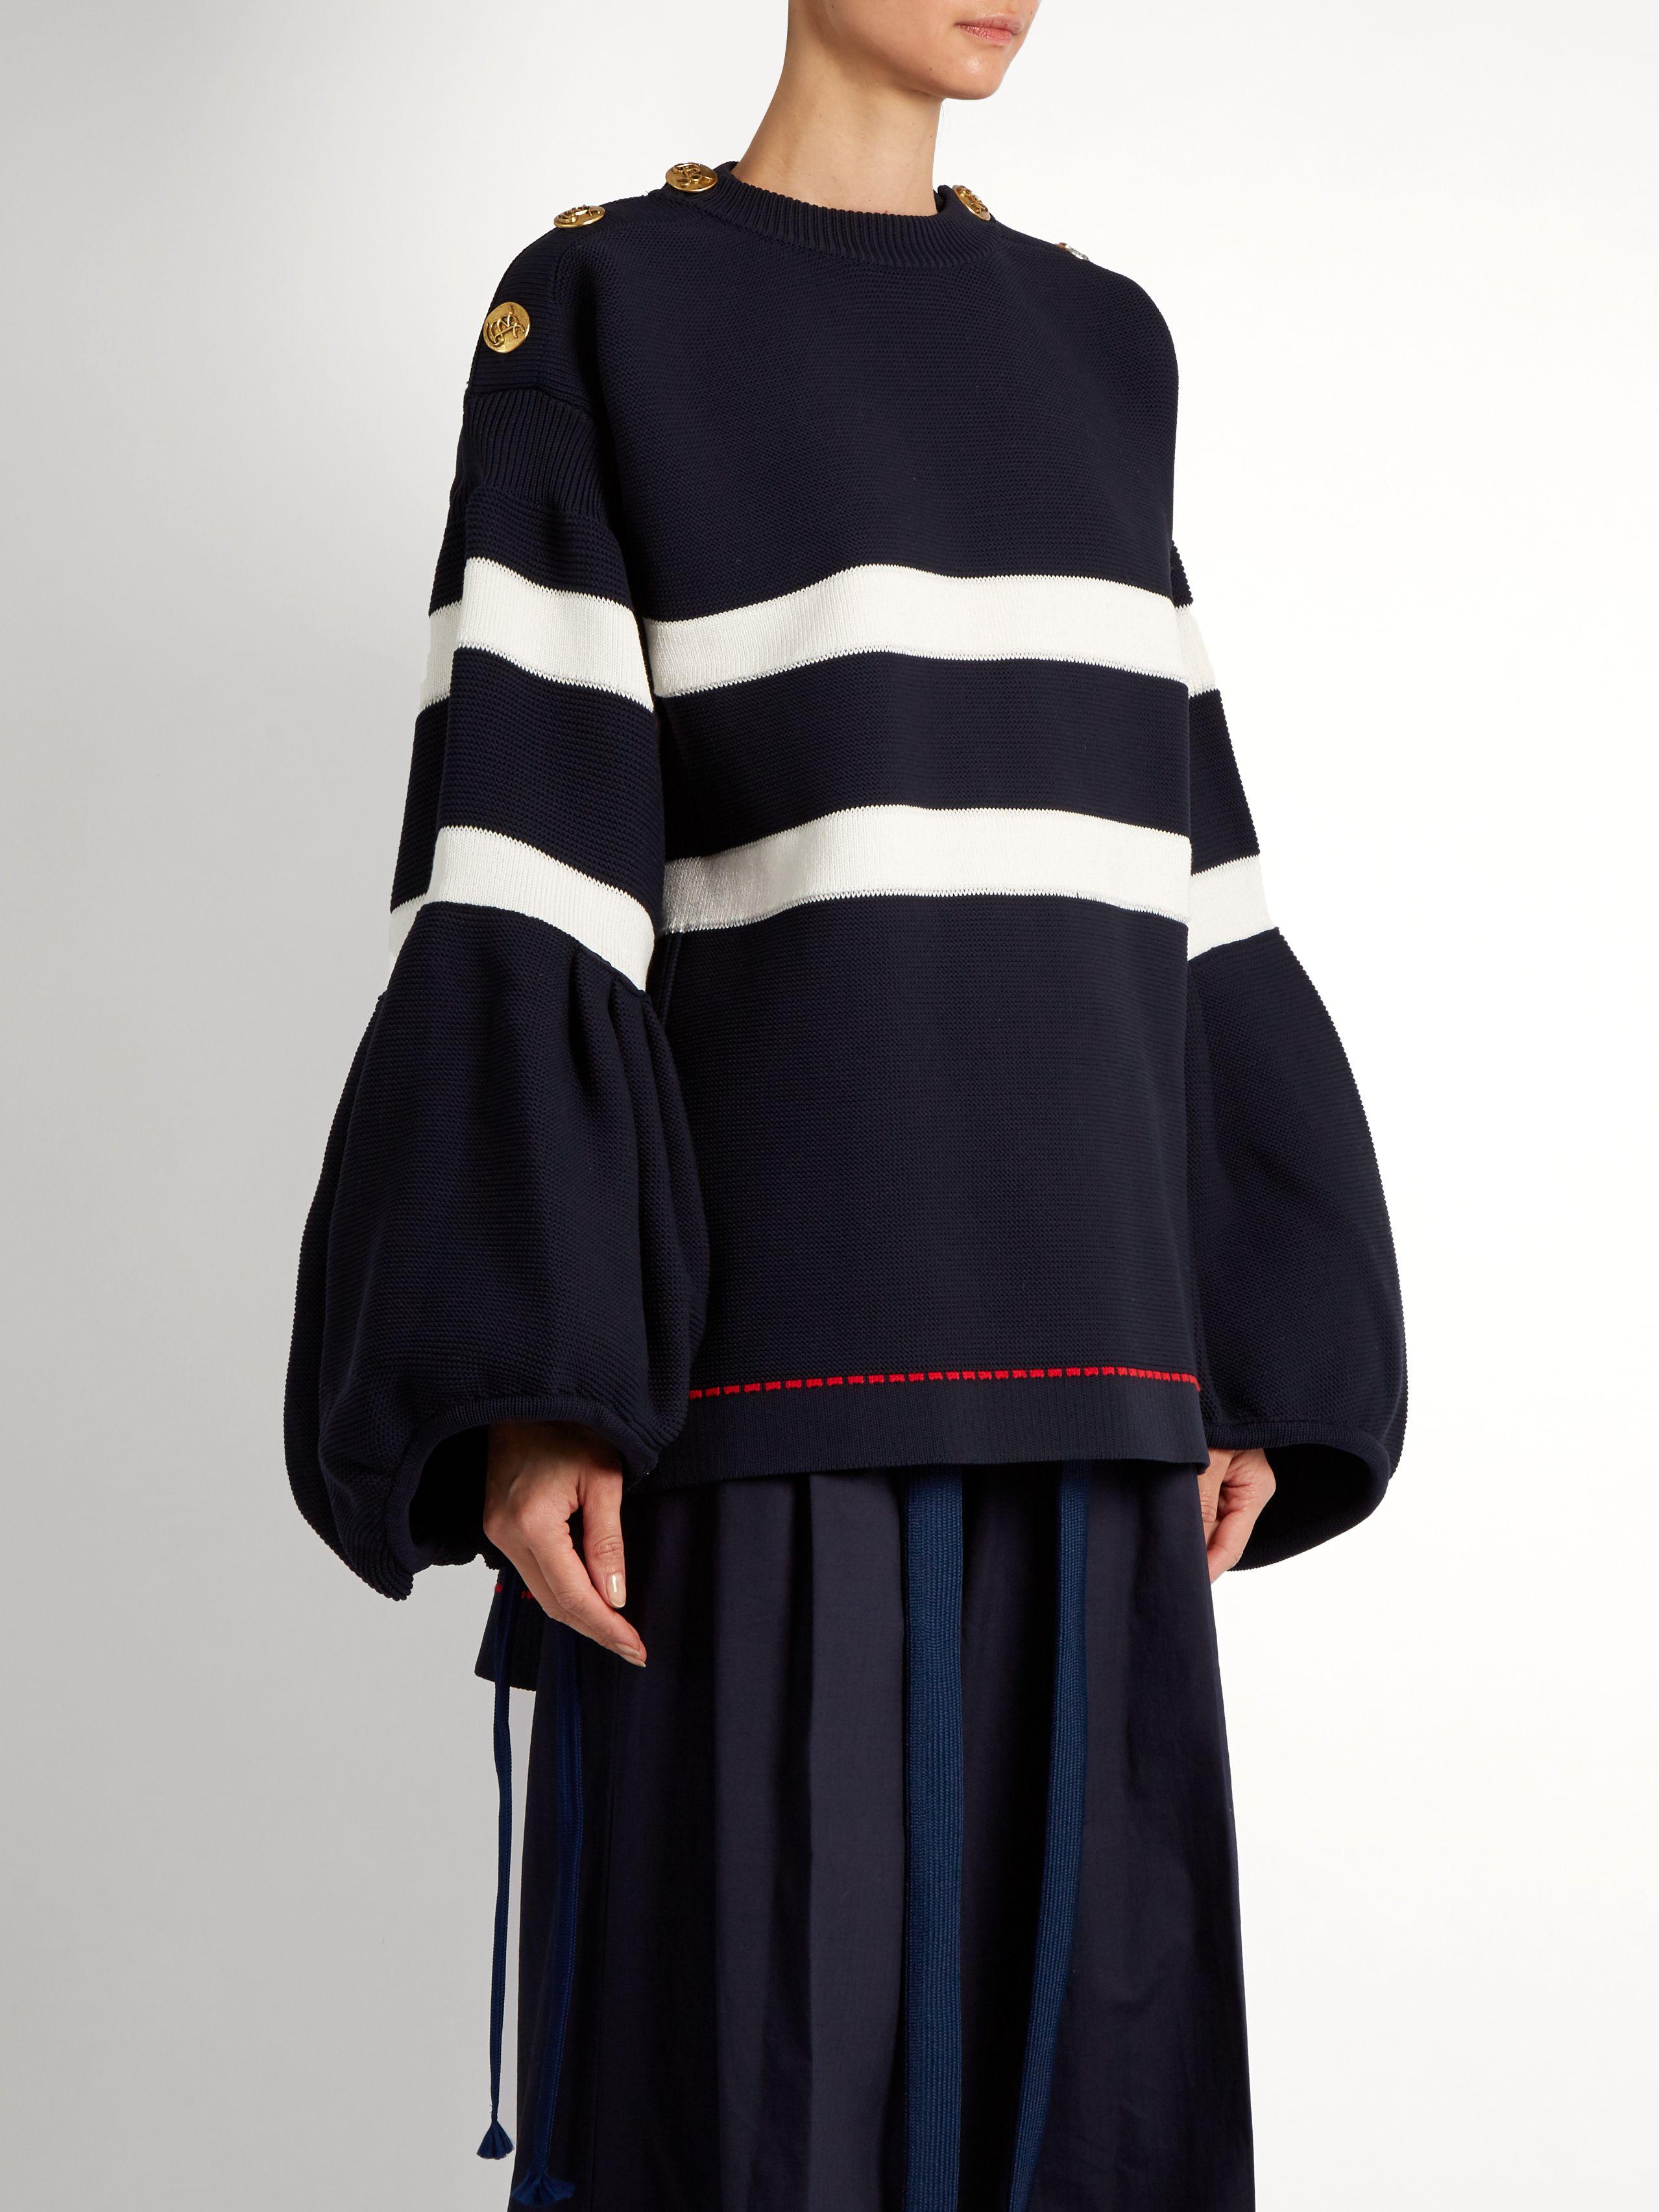 Balloon-sleeved striped sweater | Sonia Rykiel | MATCHESFASHION.COM US